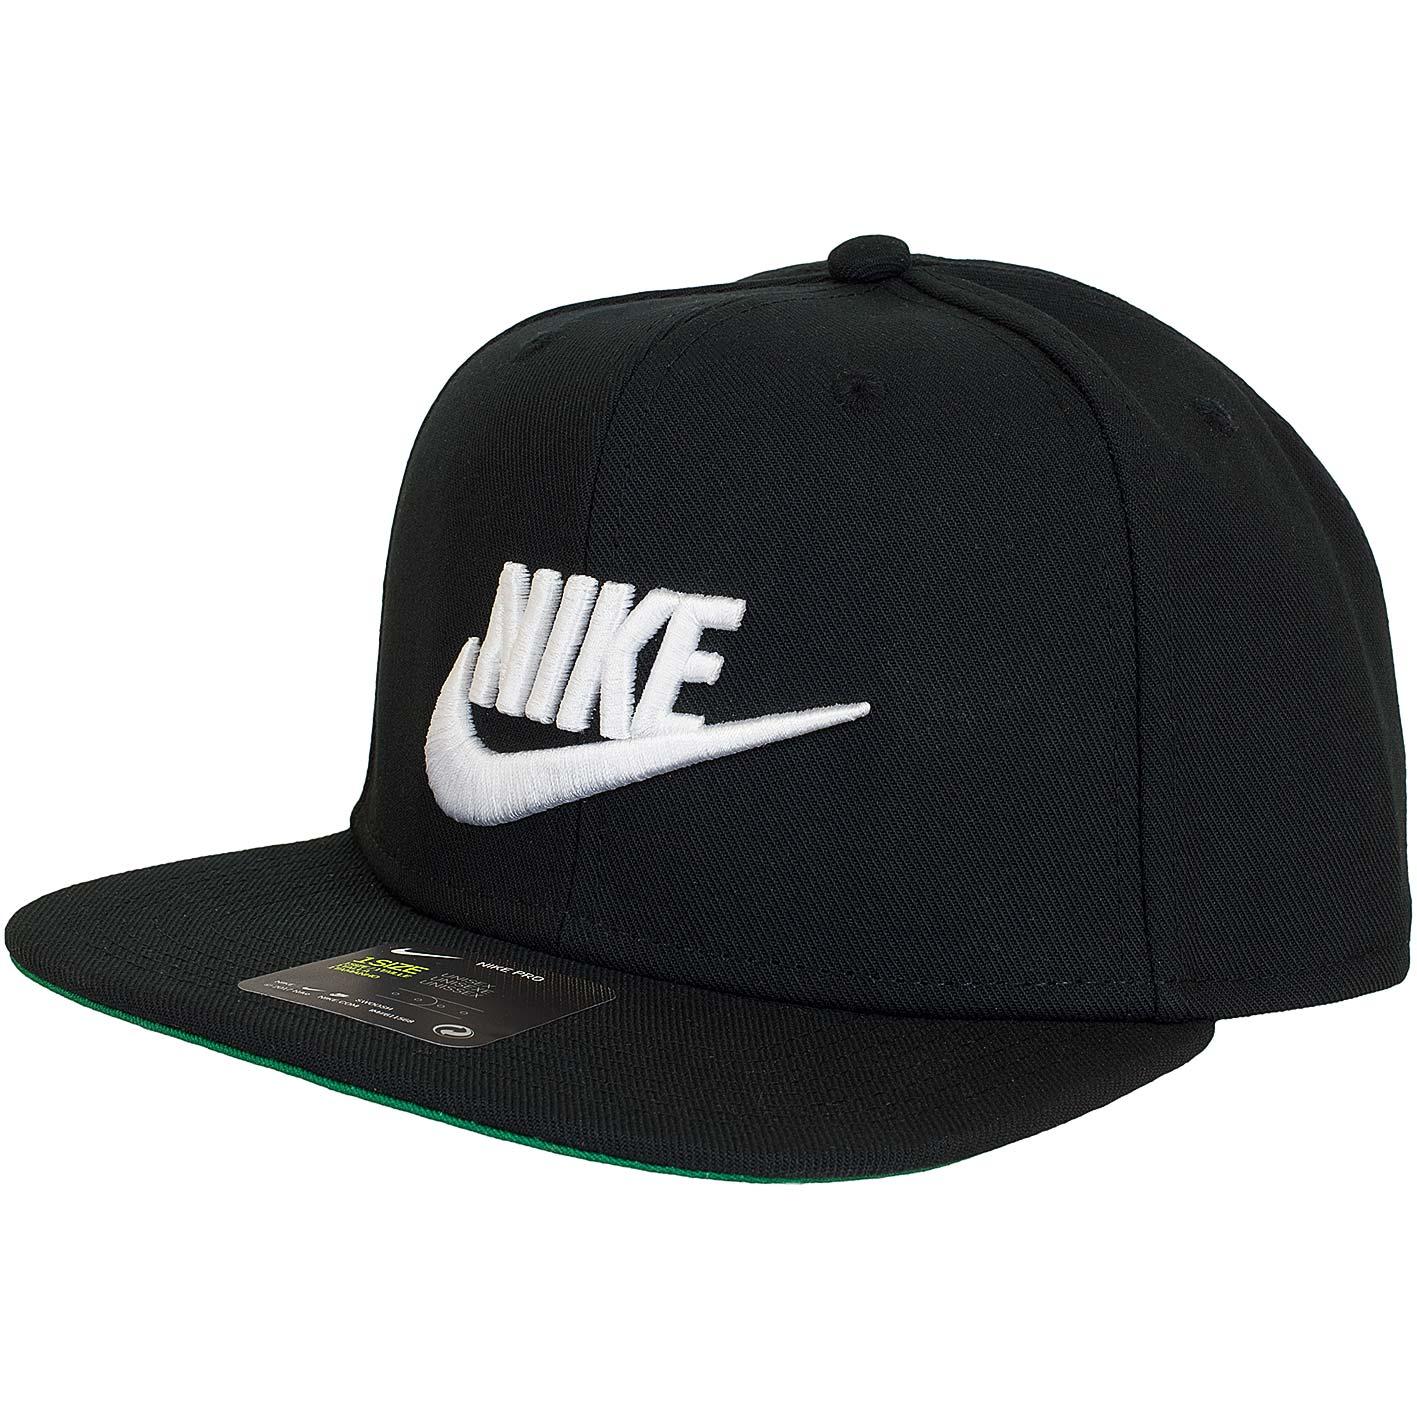 95656b108d6e0 ... cheapest nike snapback cap futura pro schwarz weiß 20655 b4831